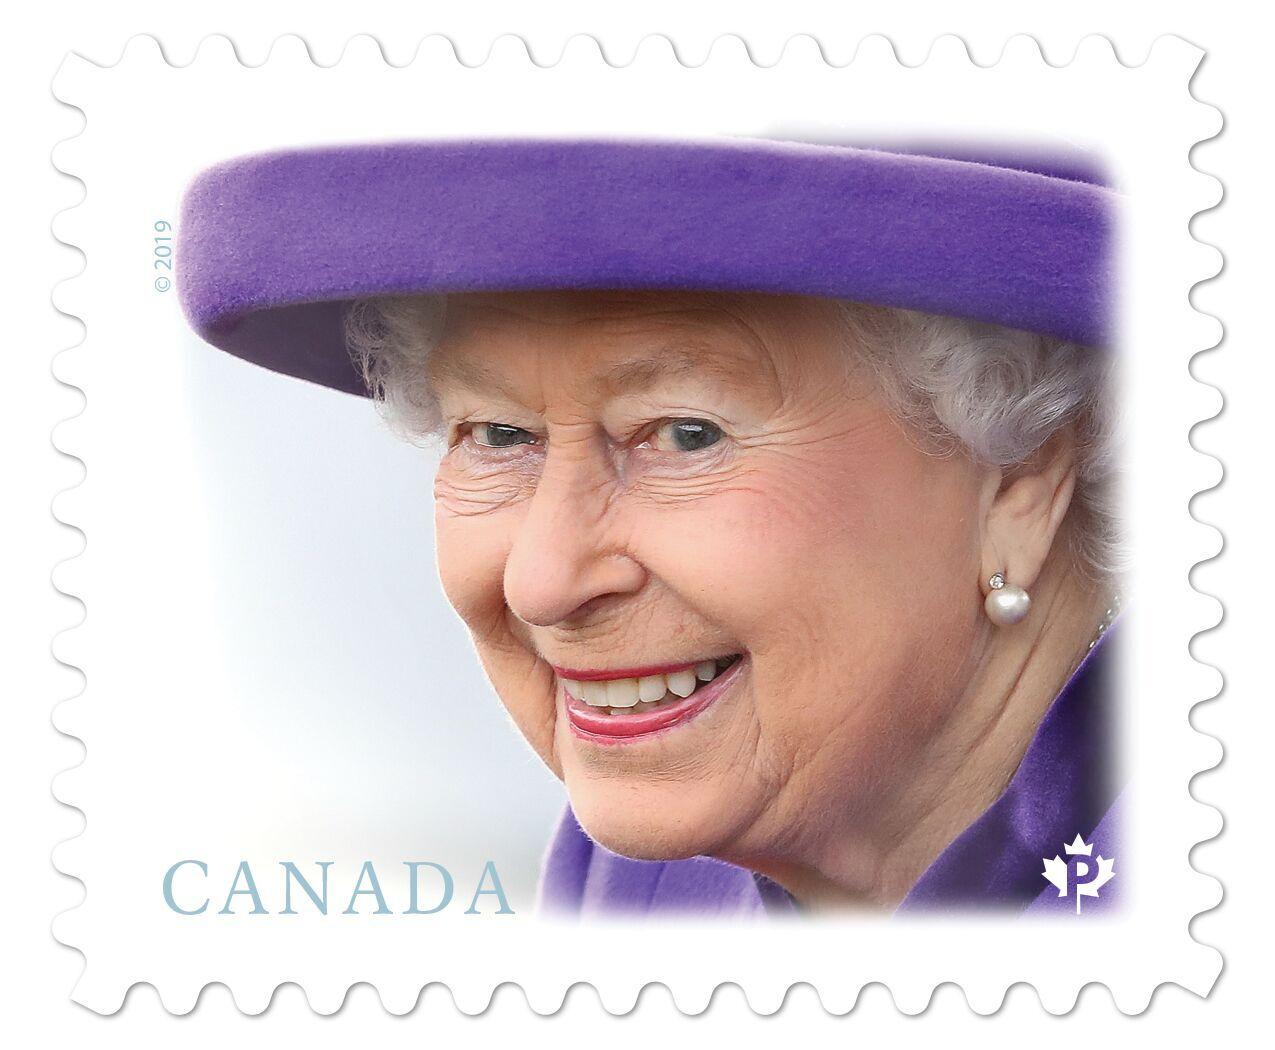 Canada - Queen Elizabeth II definitive stamp (January 14, 2019)